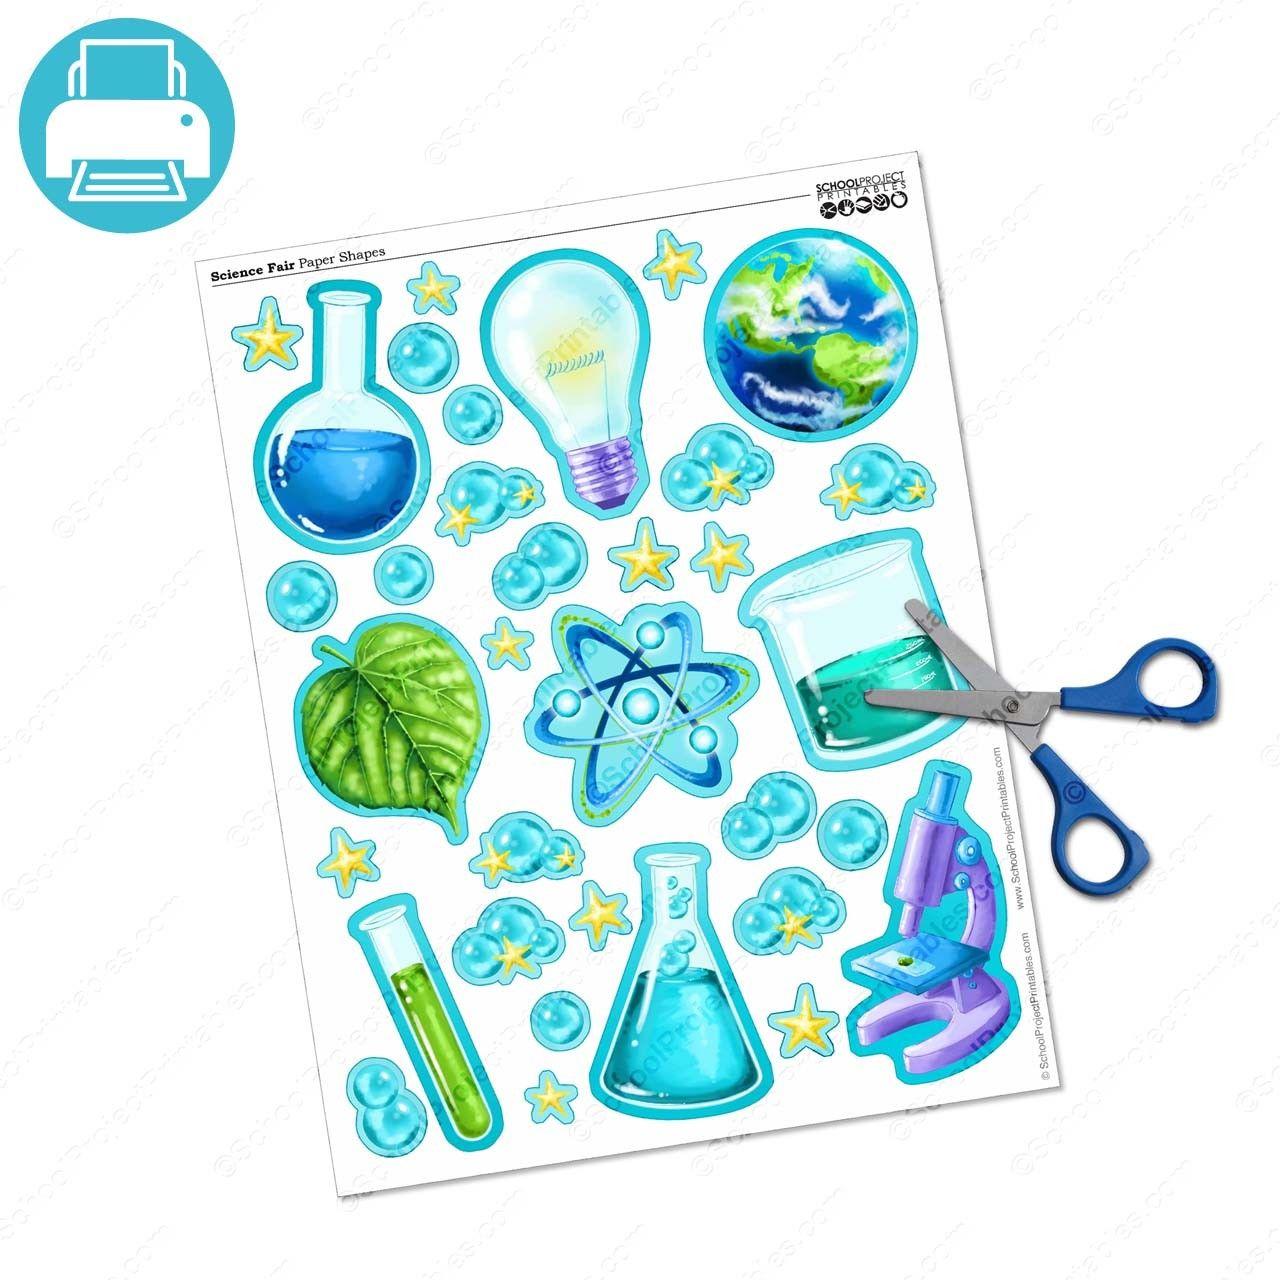 Science Fair Icons